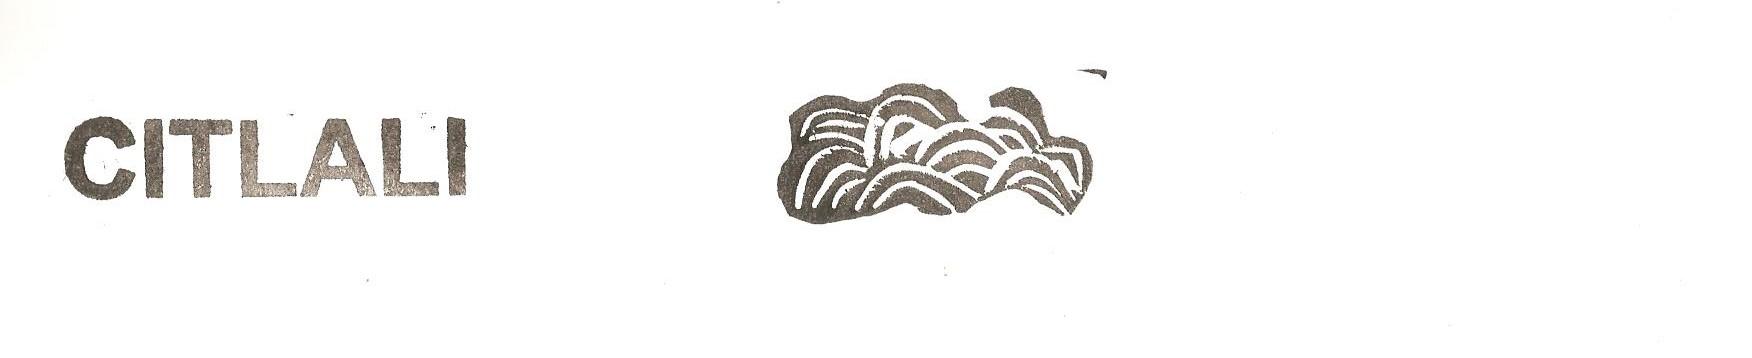 Citlali dessinatrice, glaneuse d'histoires en papier : Ultra-book